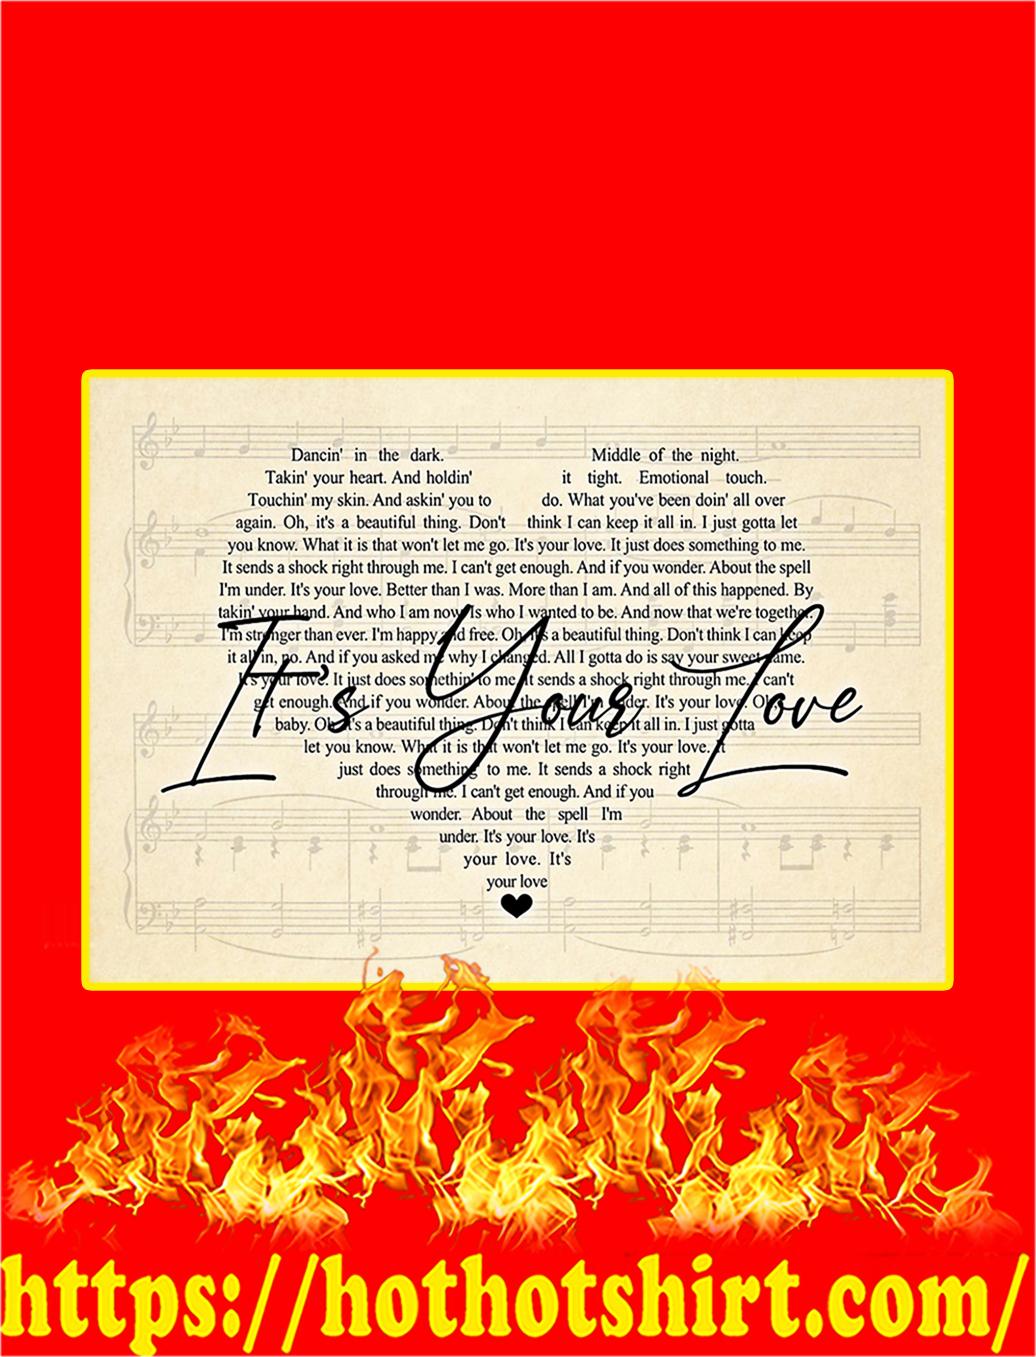 It's Your Love Lyrics Poster - A1